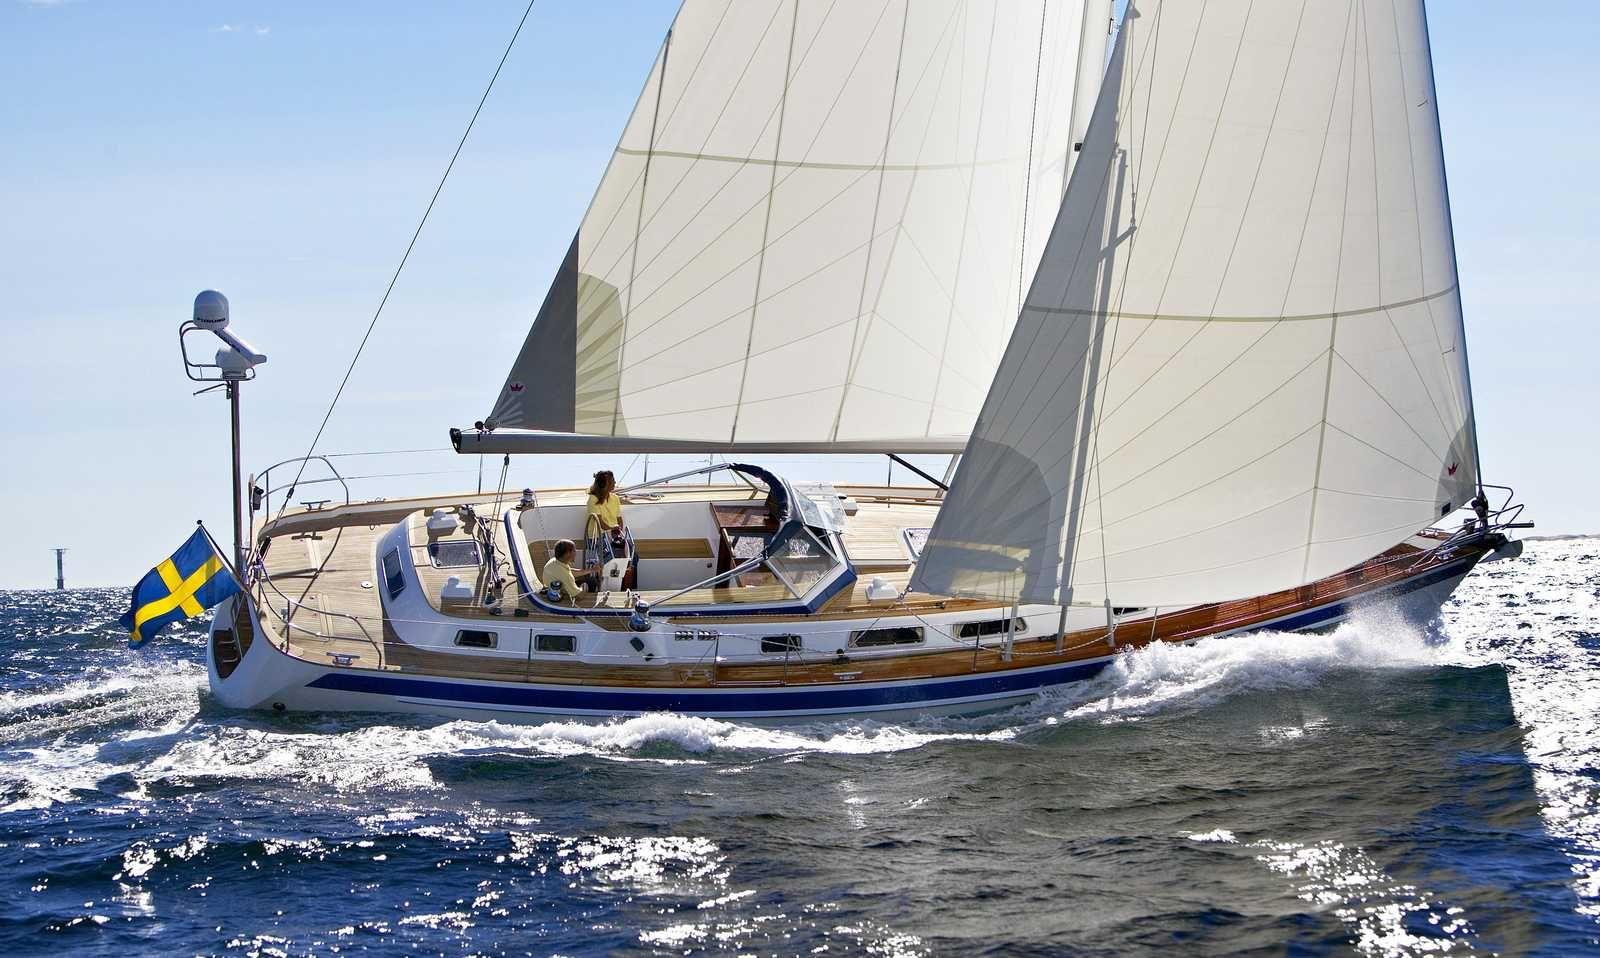 Hallberg Rassy ship in the wind.